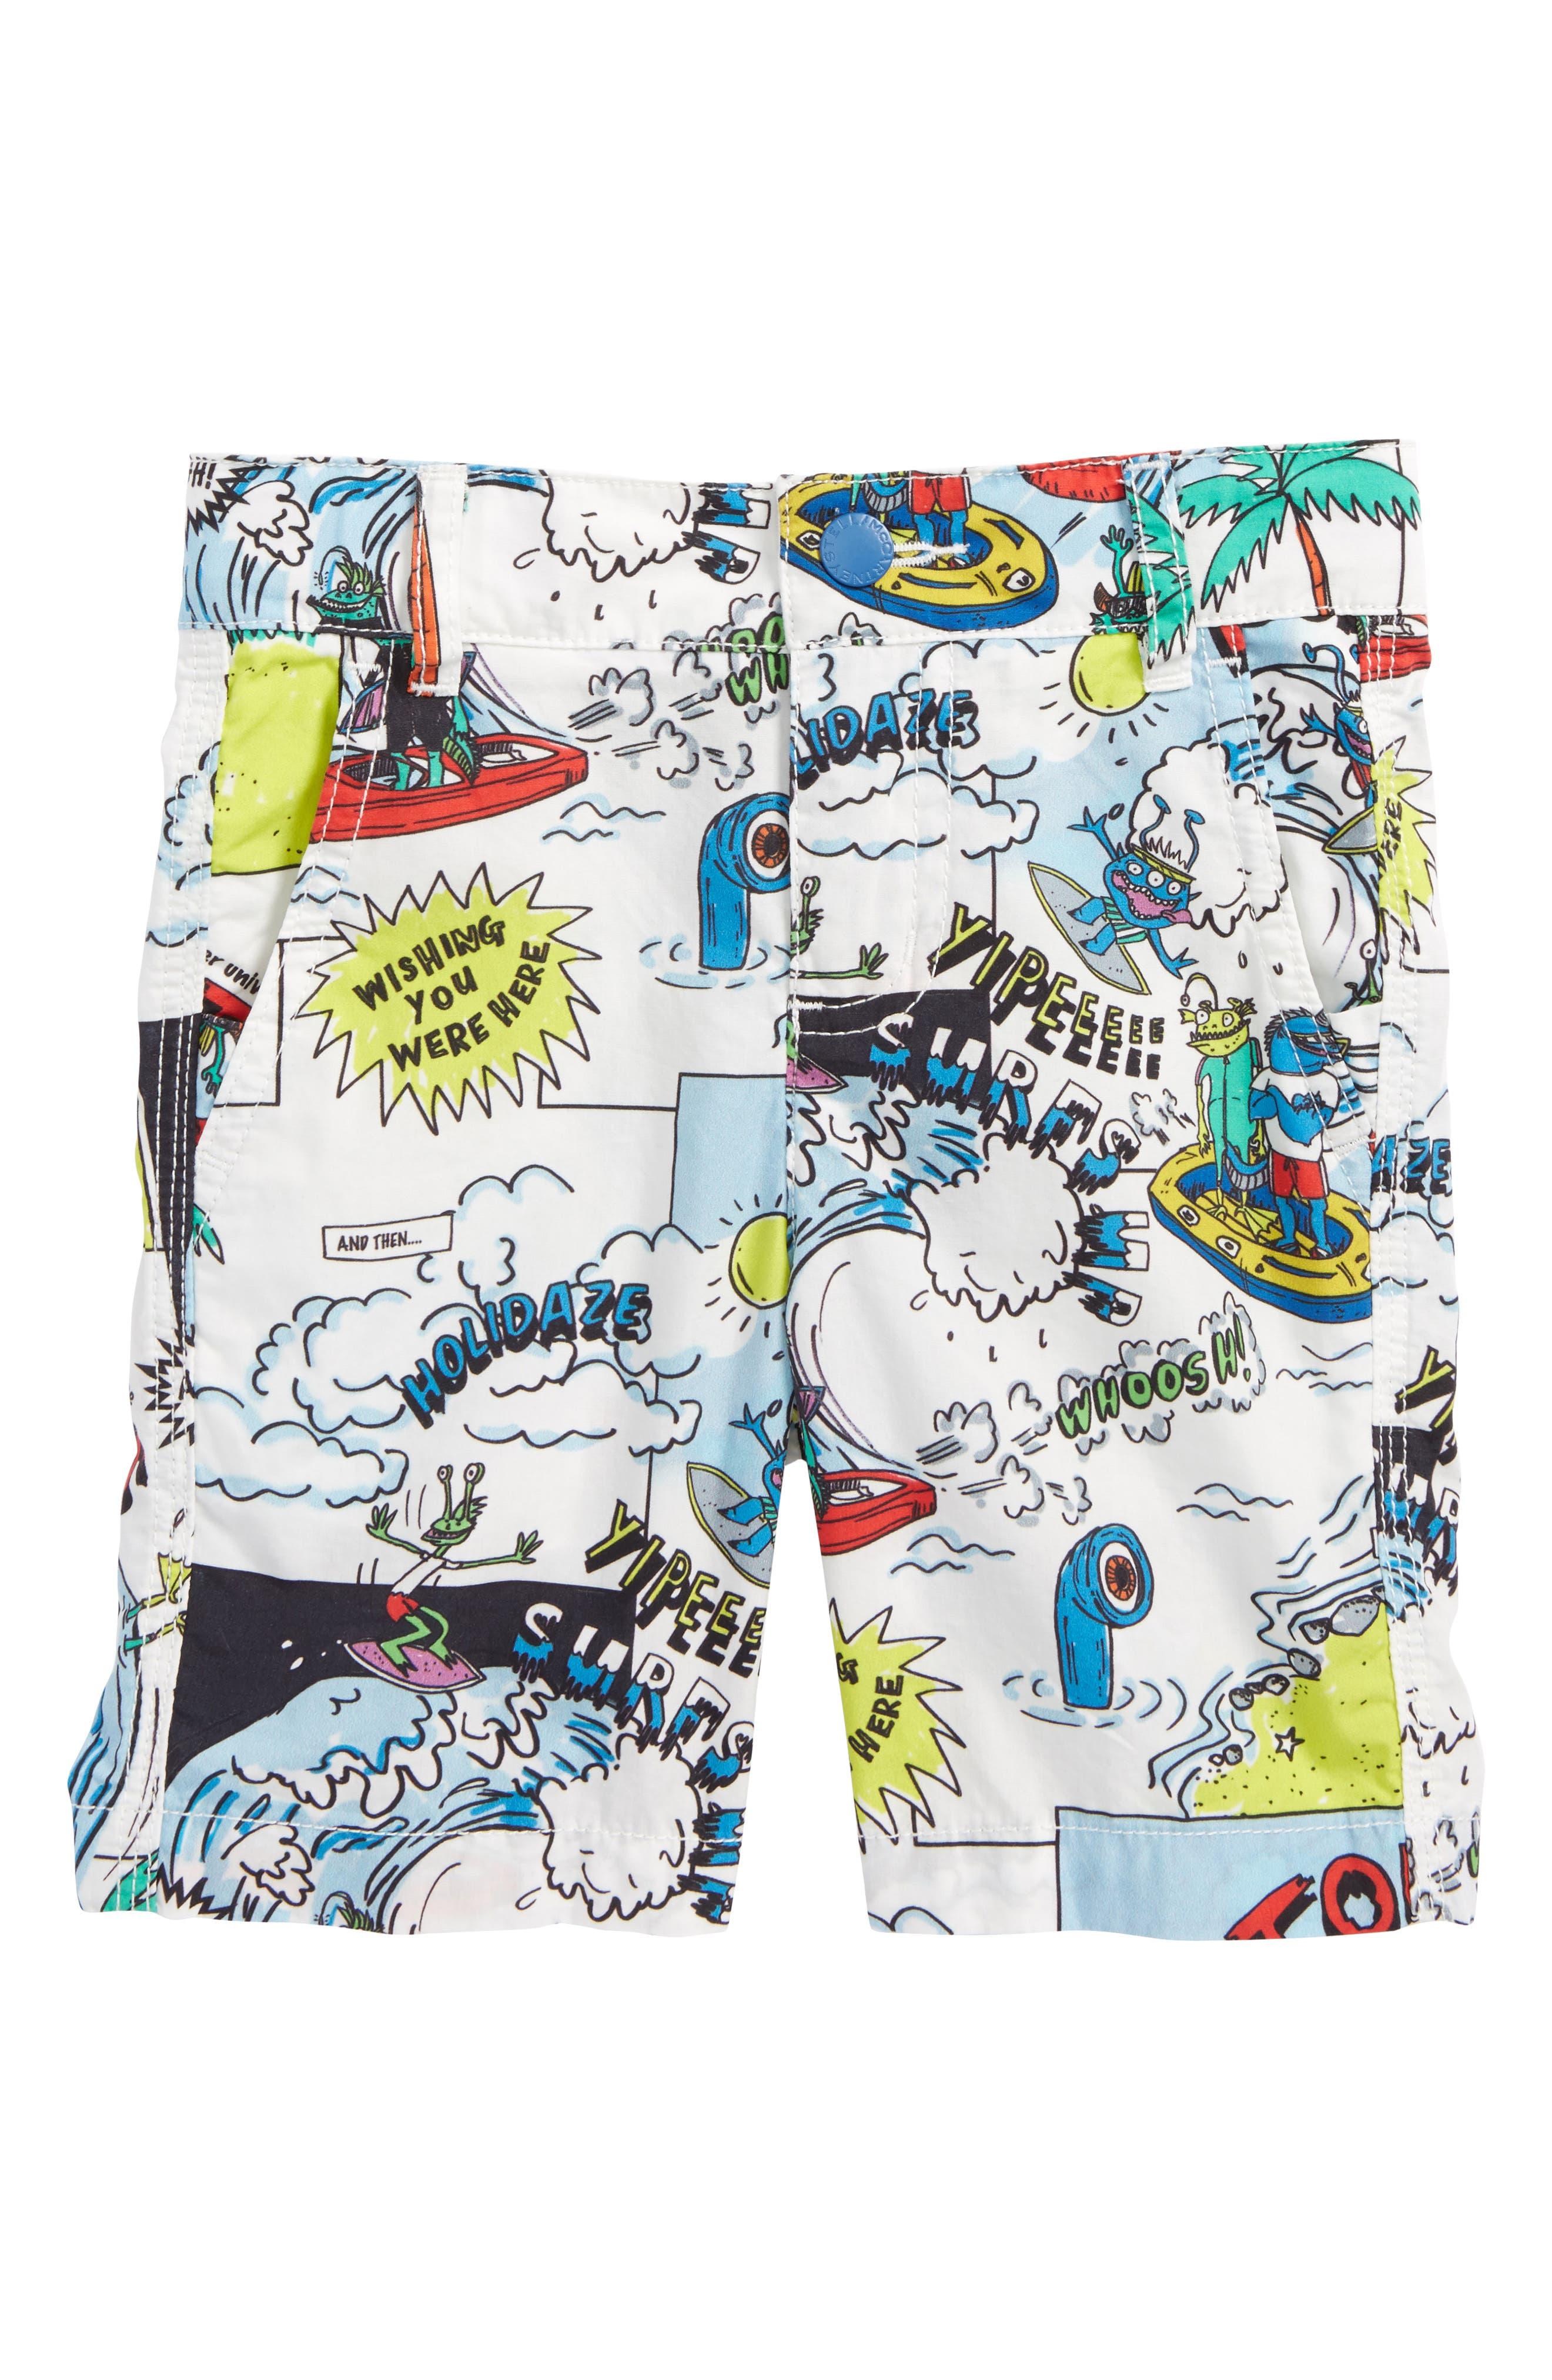 Alternate Image 1 Selected - Stella McCartney Lucas Cartoon Print Shorts (Toddler Boys, Little Boys & Big Boys)